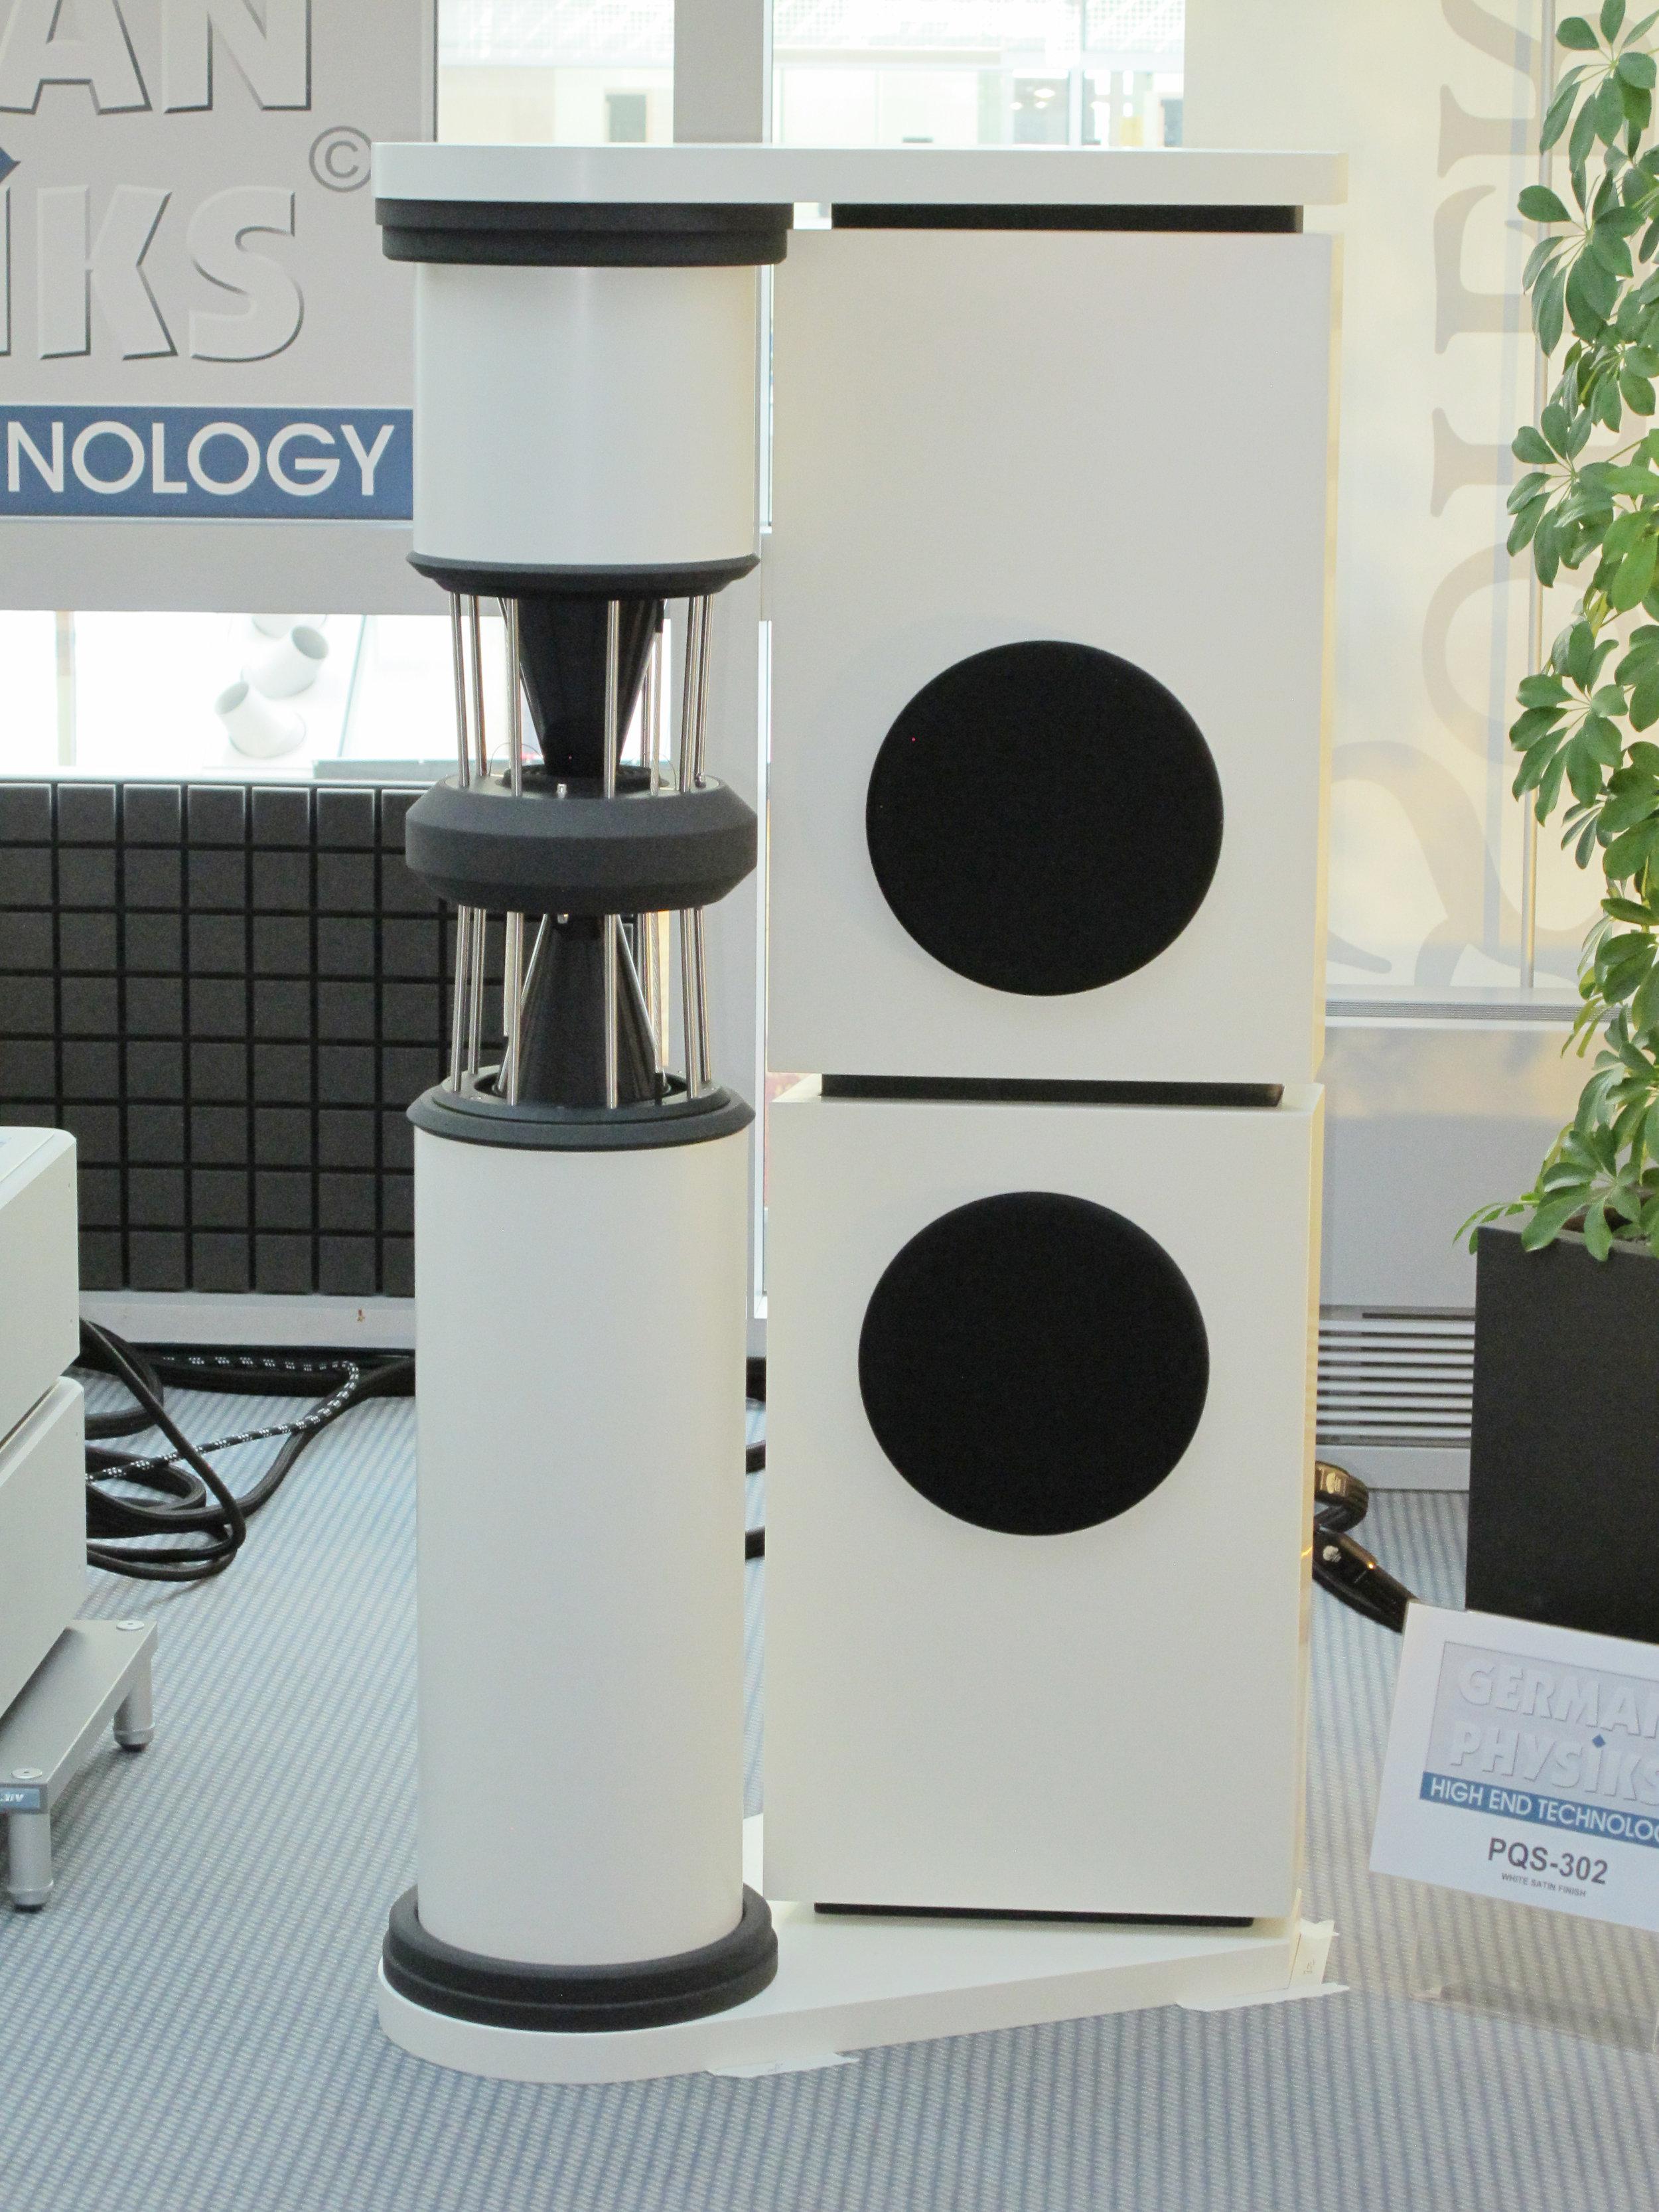 PQS-302 loudspeaker | Munich Hi-Fi Show 2014, Germany